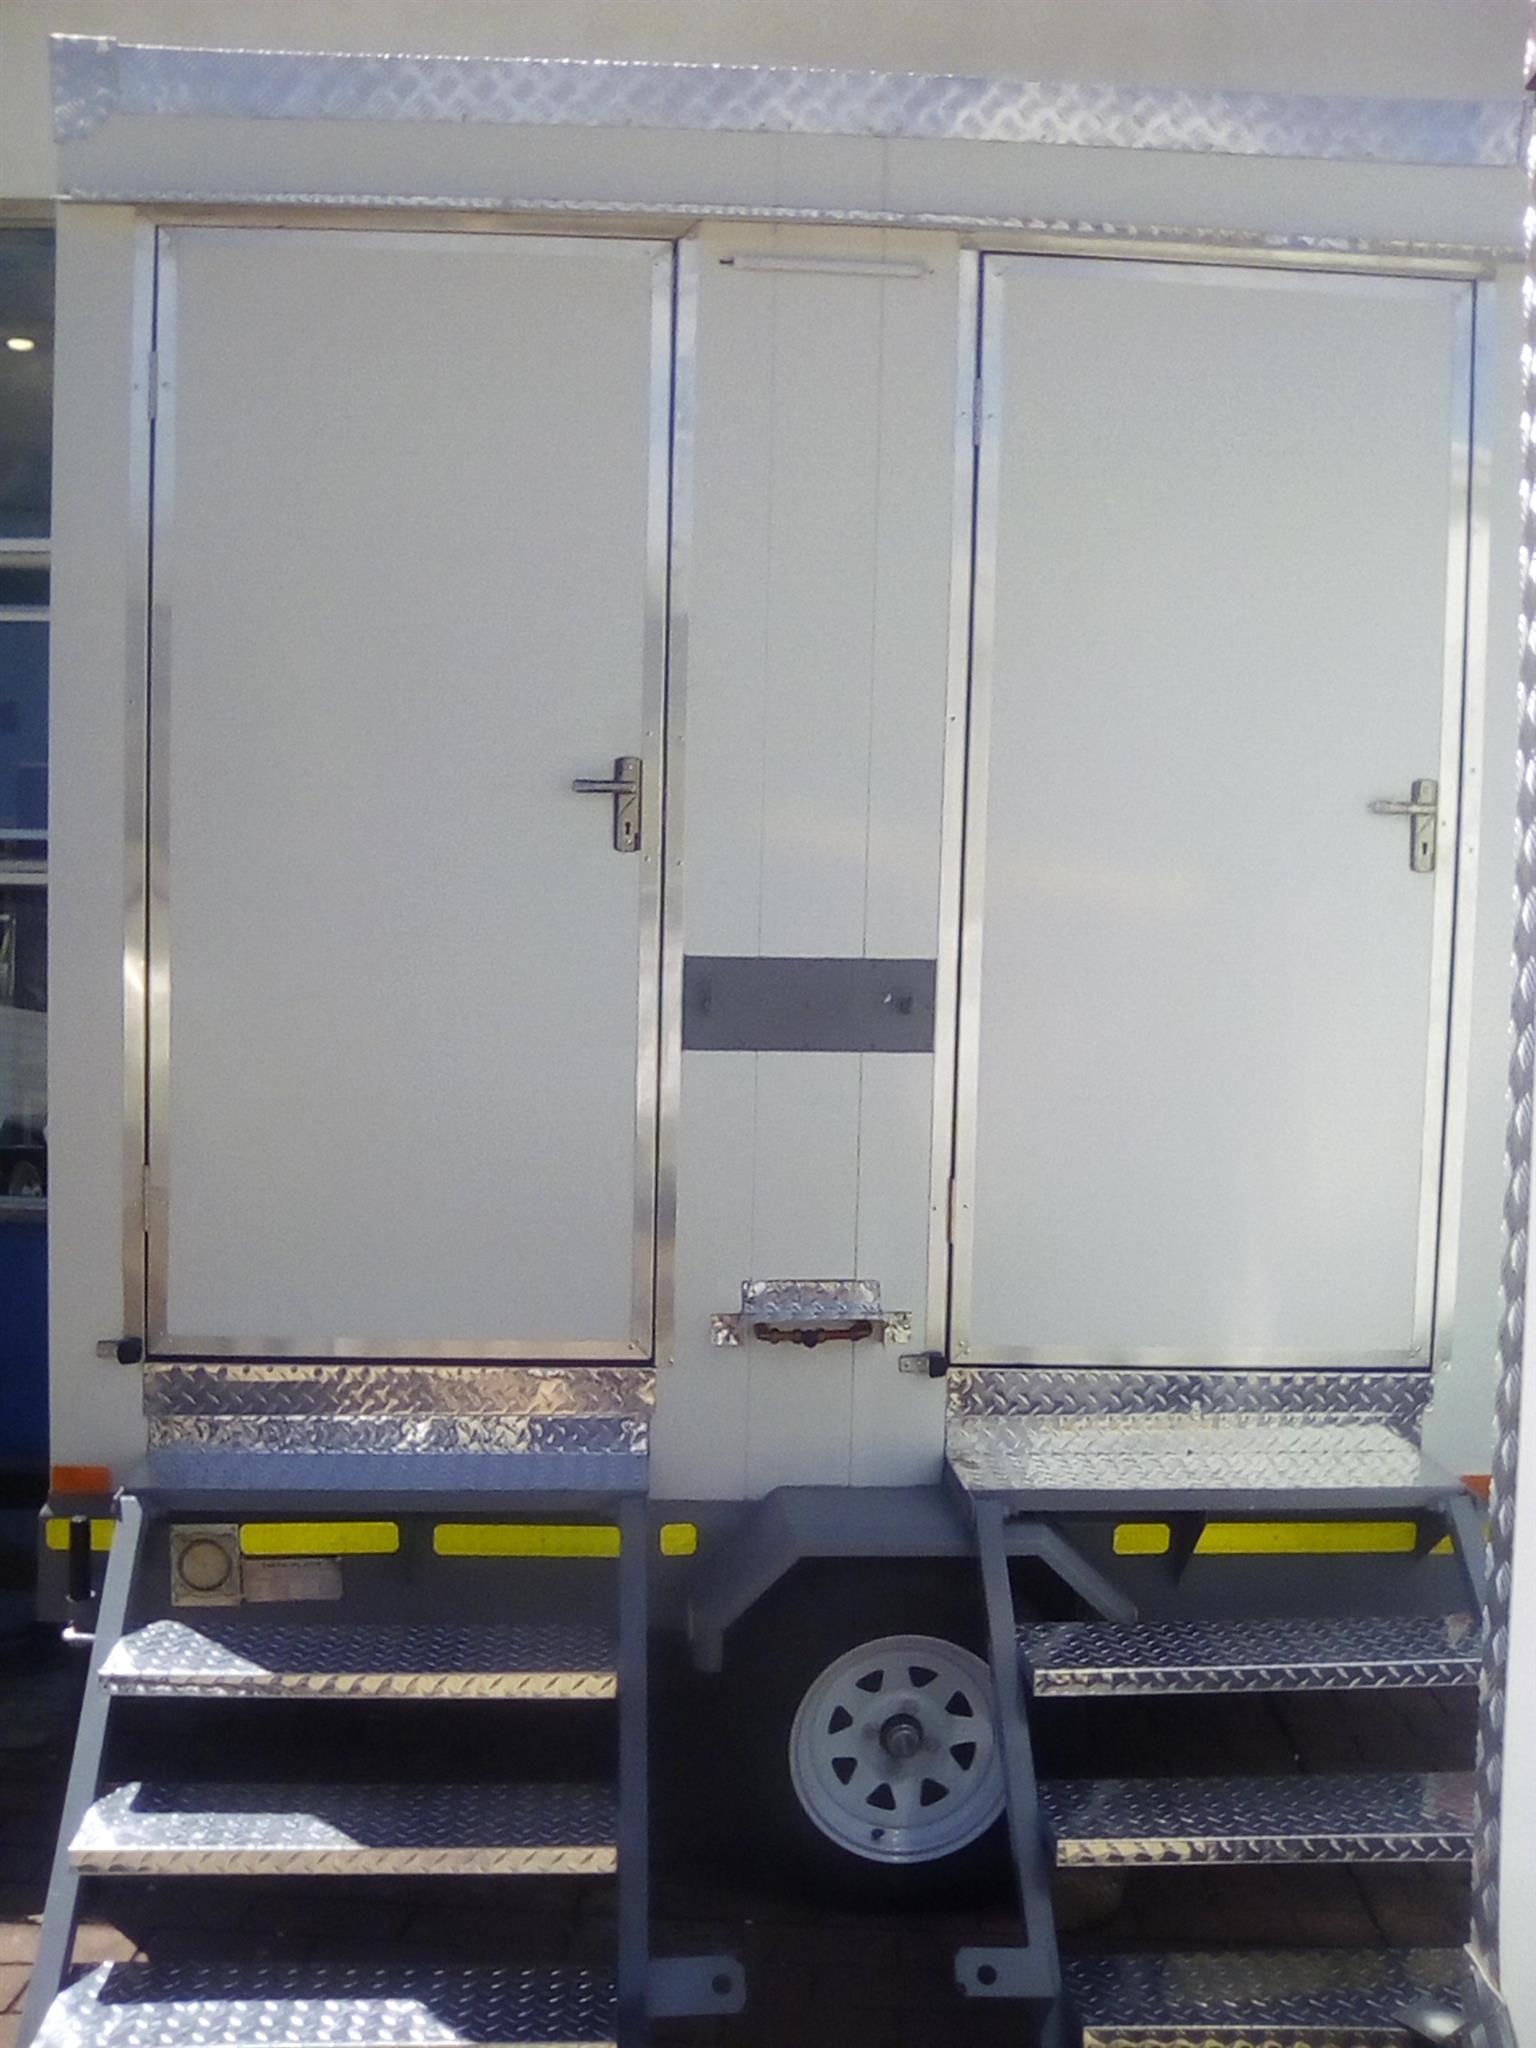 Mobile VIP toilets